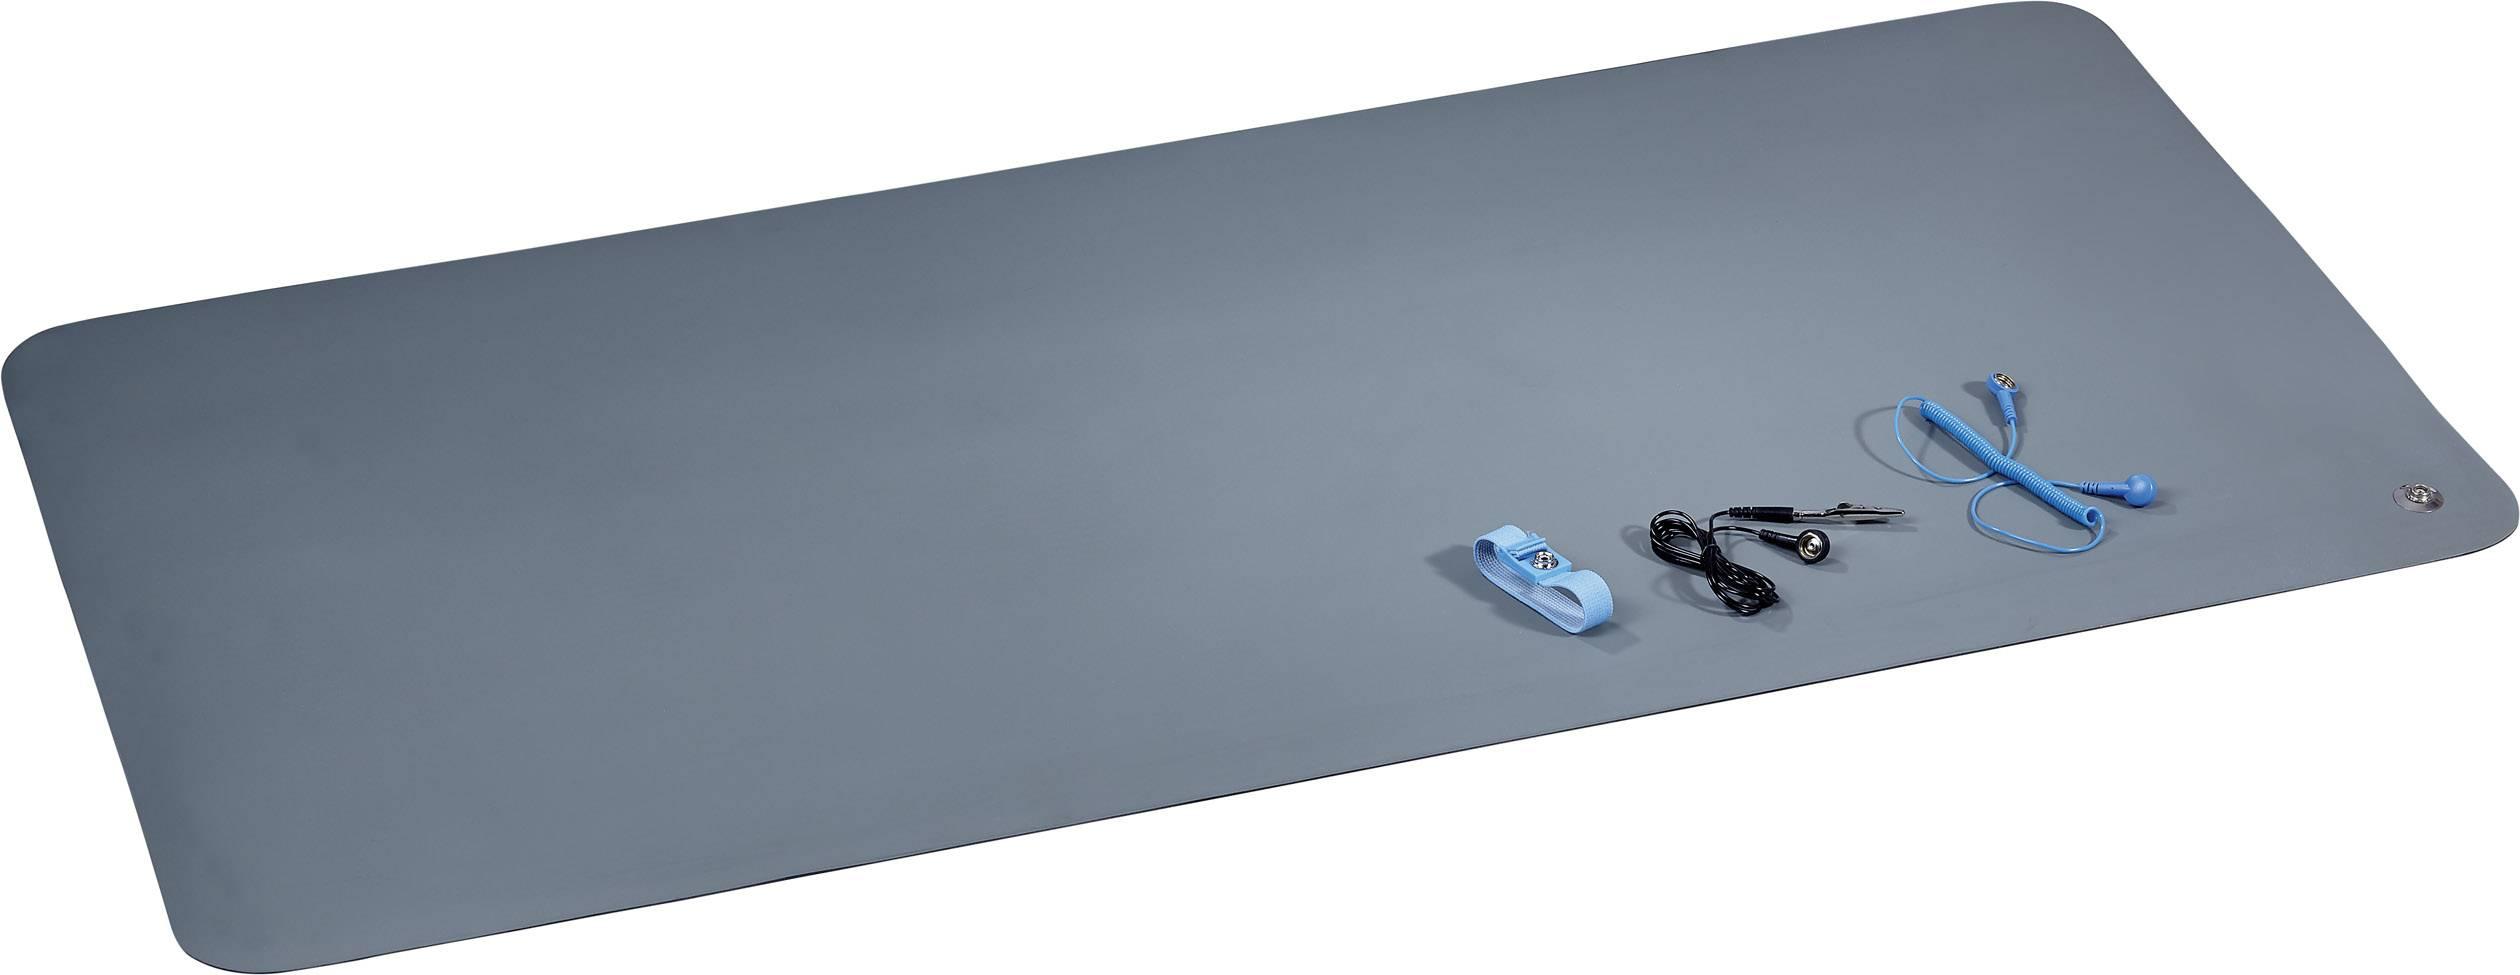 Sada ESD podložky na stůl TRU COMPONENTS 1605860, (d x š) 119 cm x 59 cm, šedozelená, černá